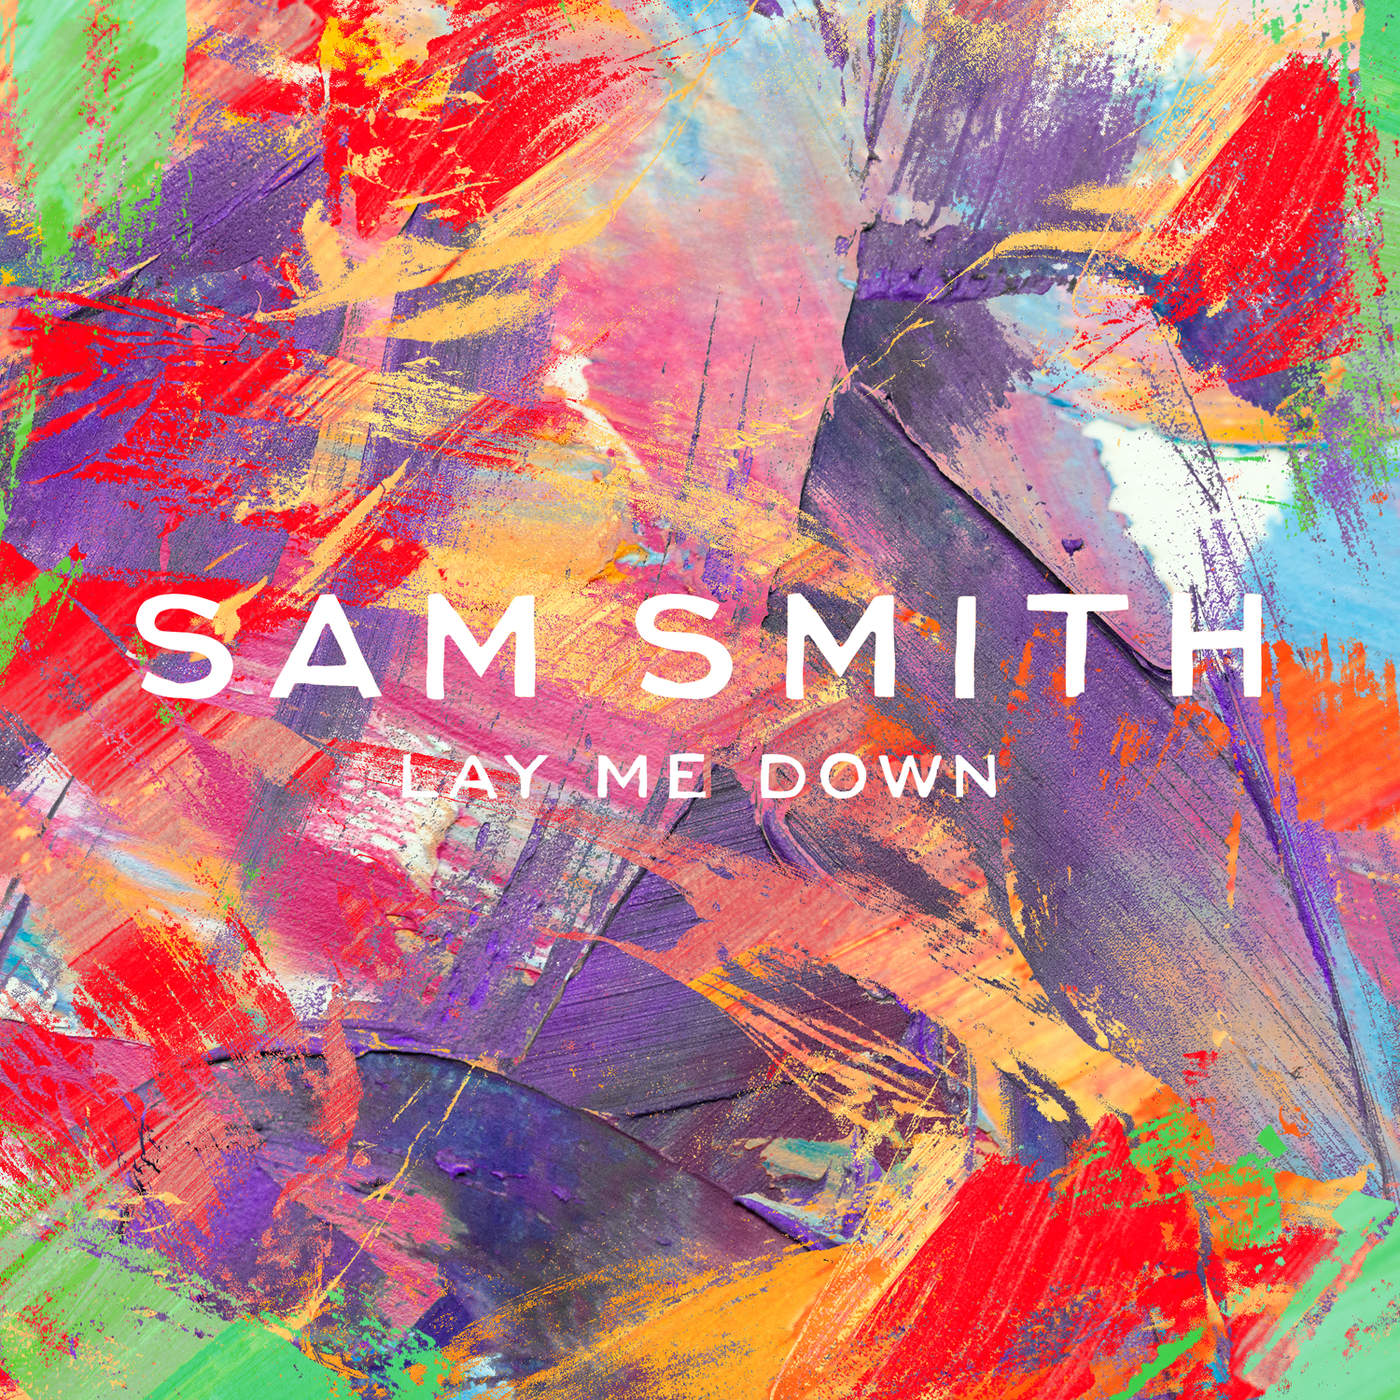 Sam Smith - Lay Me Down - Single Cover